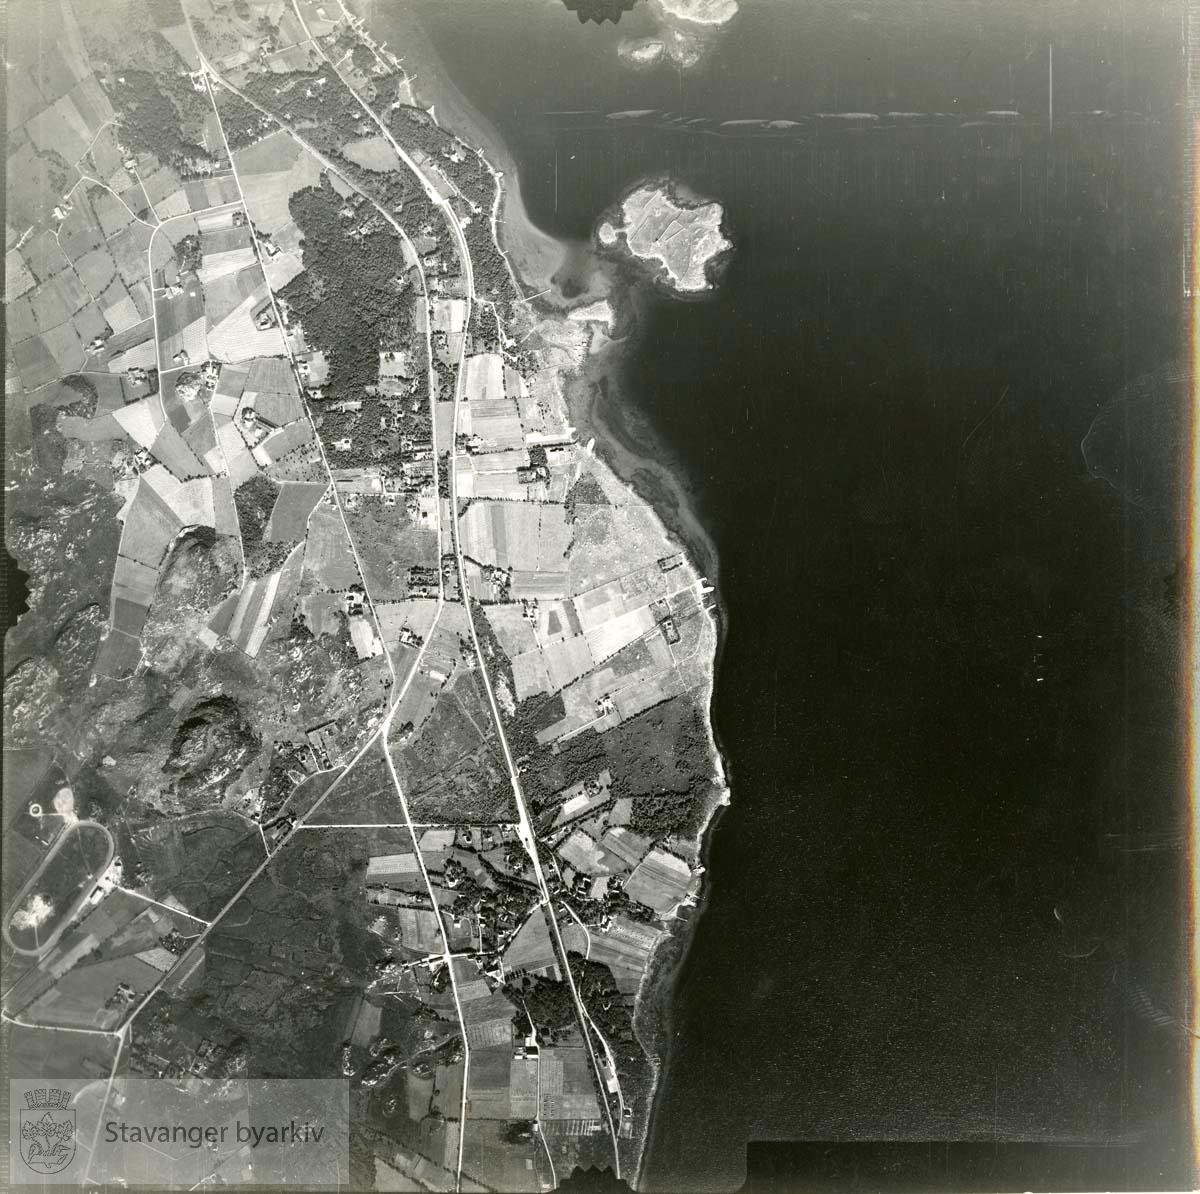 Jfr. kart/fotoplan F20/549..Forus og Gausel..Se ByStW_Uca_002 (kan lastes ned under fanen for kart på Stavangerbilder)